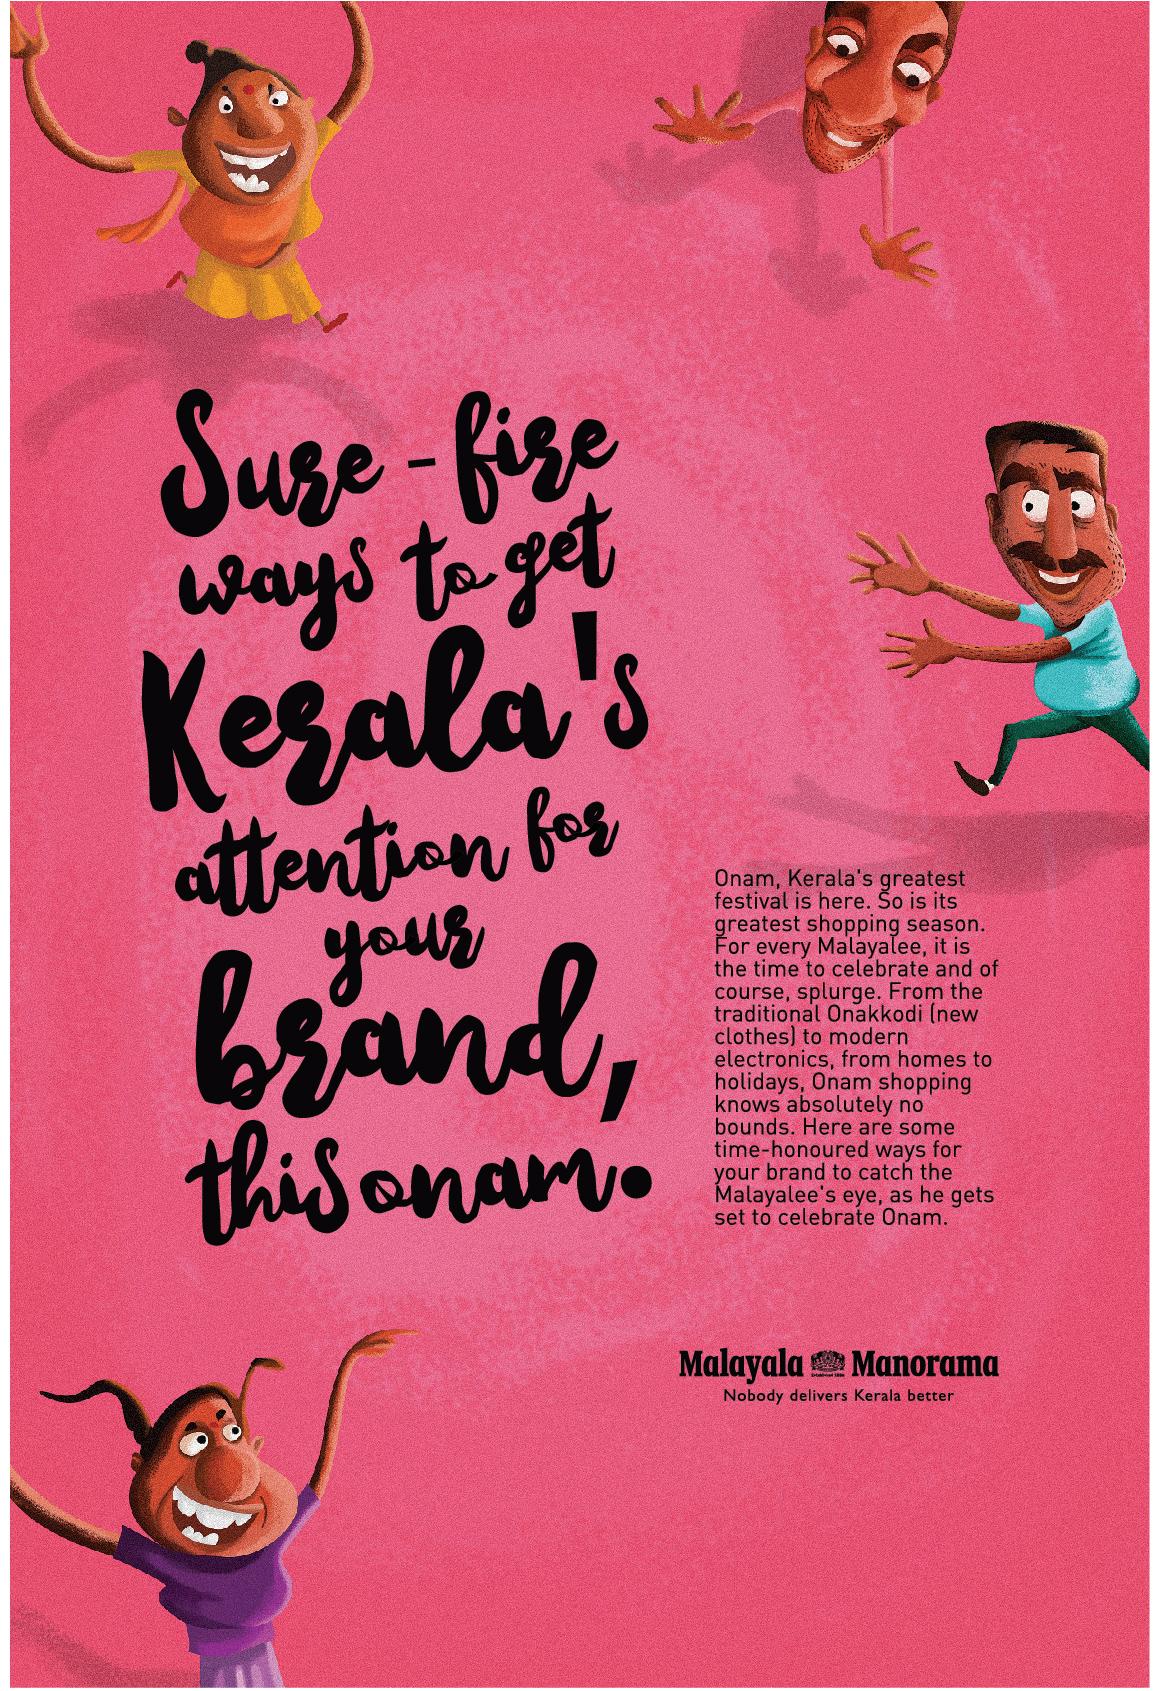 How to Catch a Malayalee by Malayala Manorama   Print mock-up 4 by Stark Communications Pvt Ltd